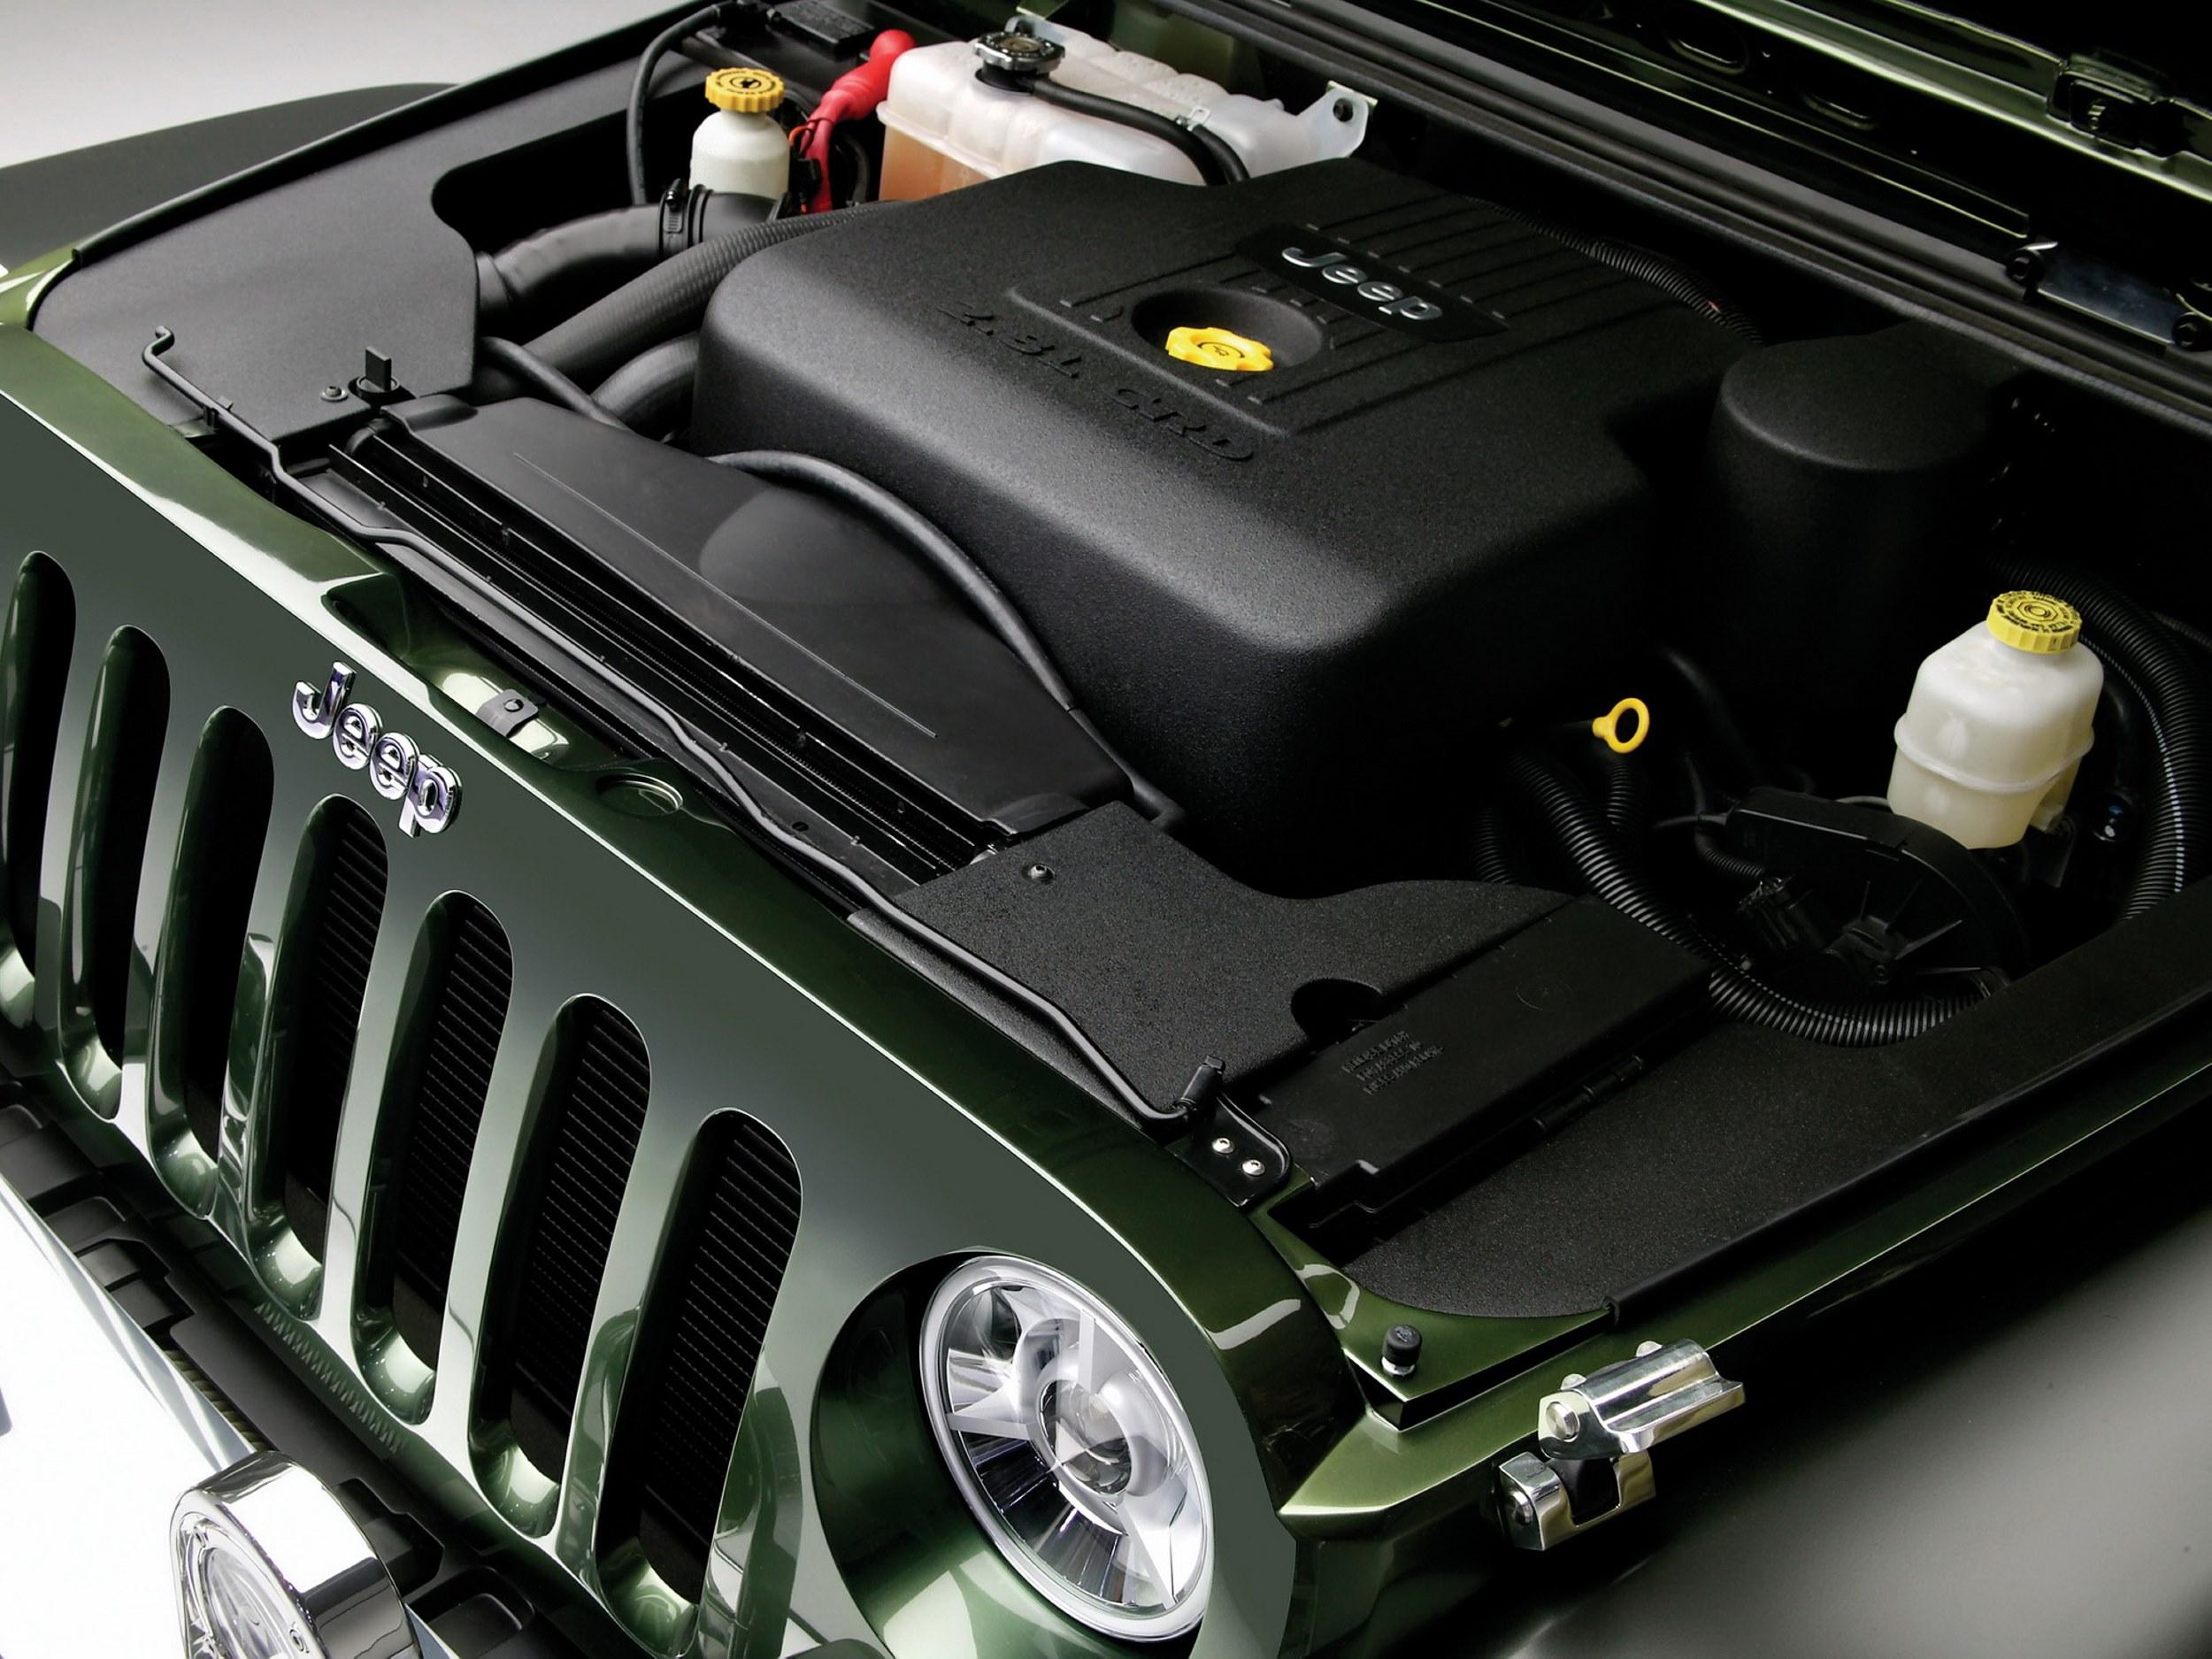 autowp.ru jeep gladiator concept 4.jpg jeep gladiator concept 4